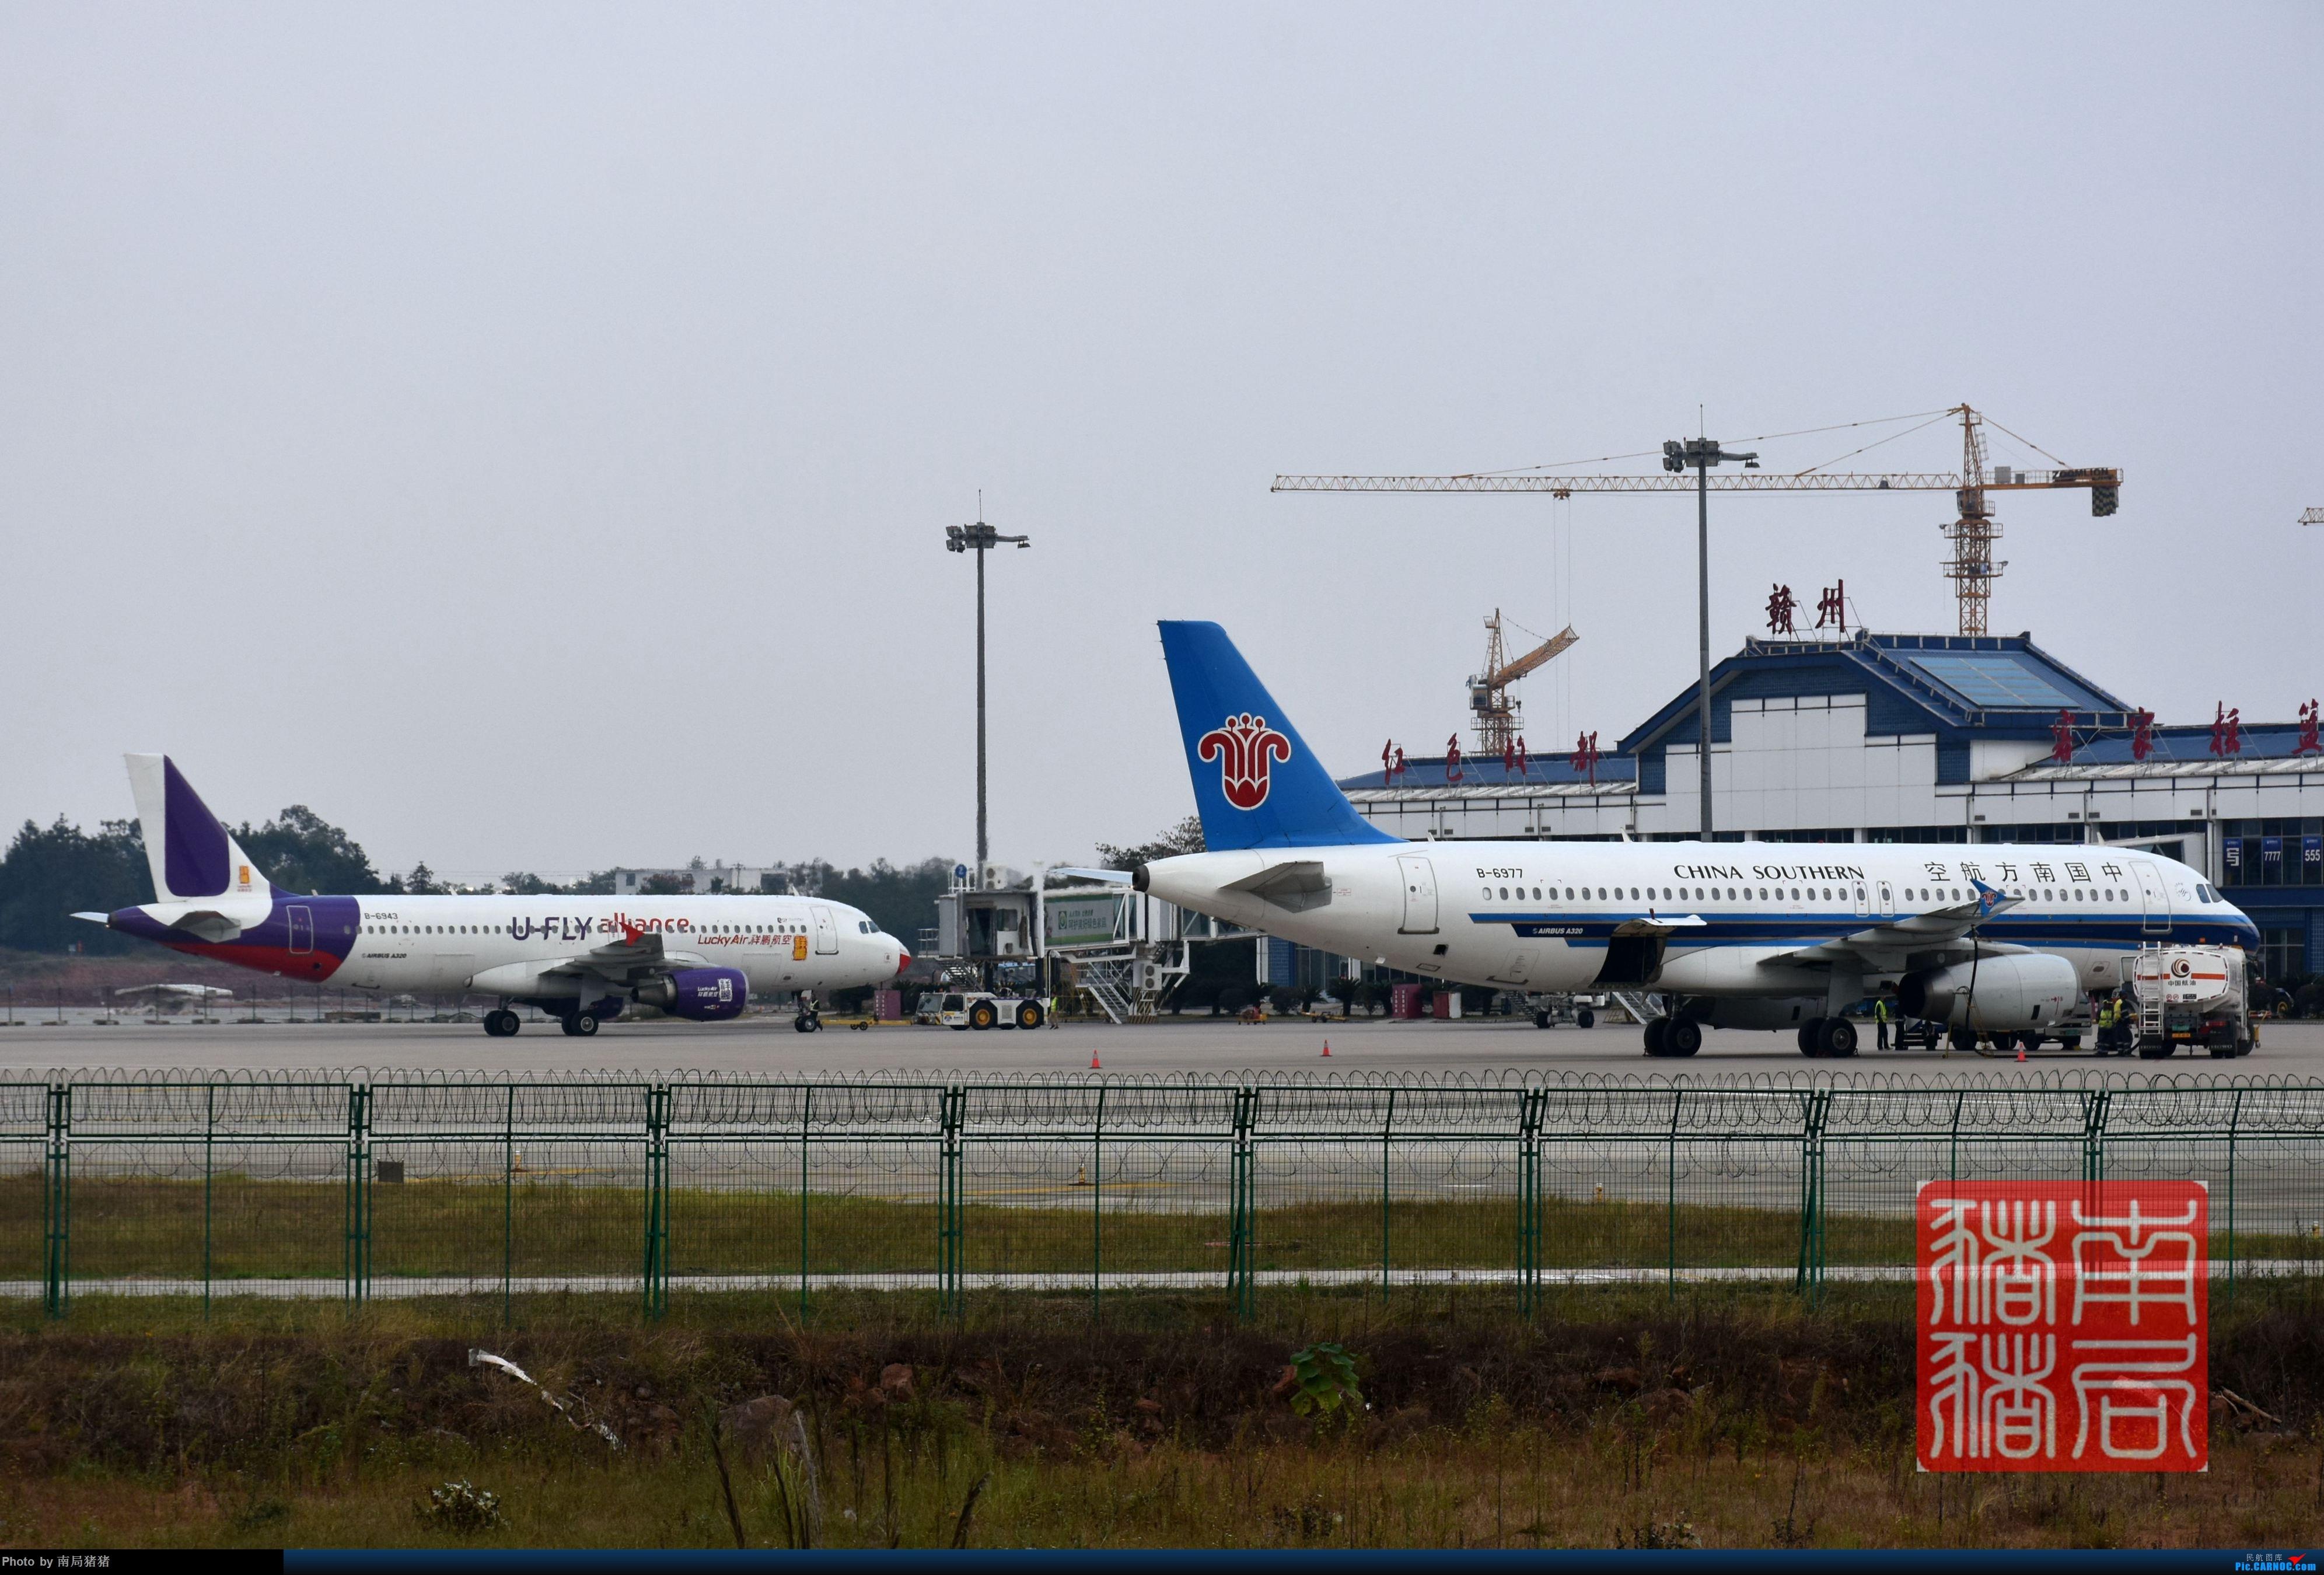 Re:[原创]赣州黄金机场,U fly 涂装320 AIRBUS A320-200 B-6943 中国赣州黄金机场